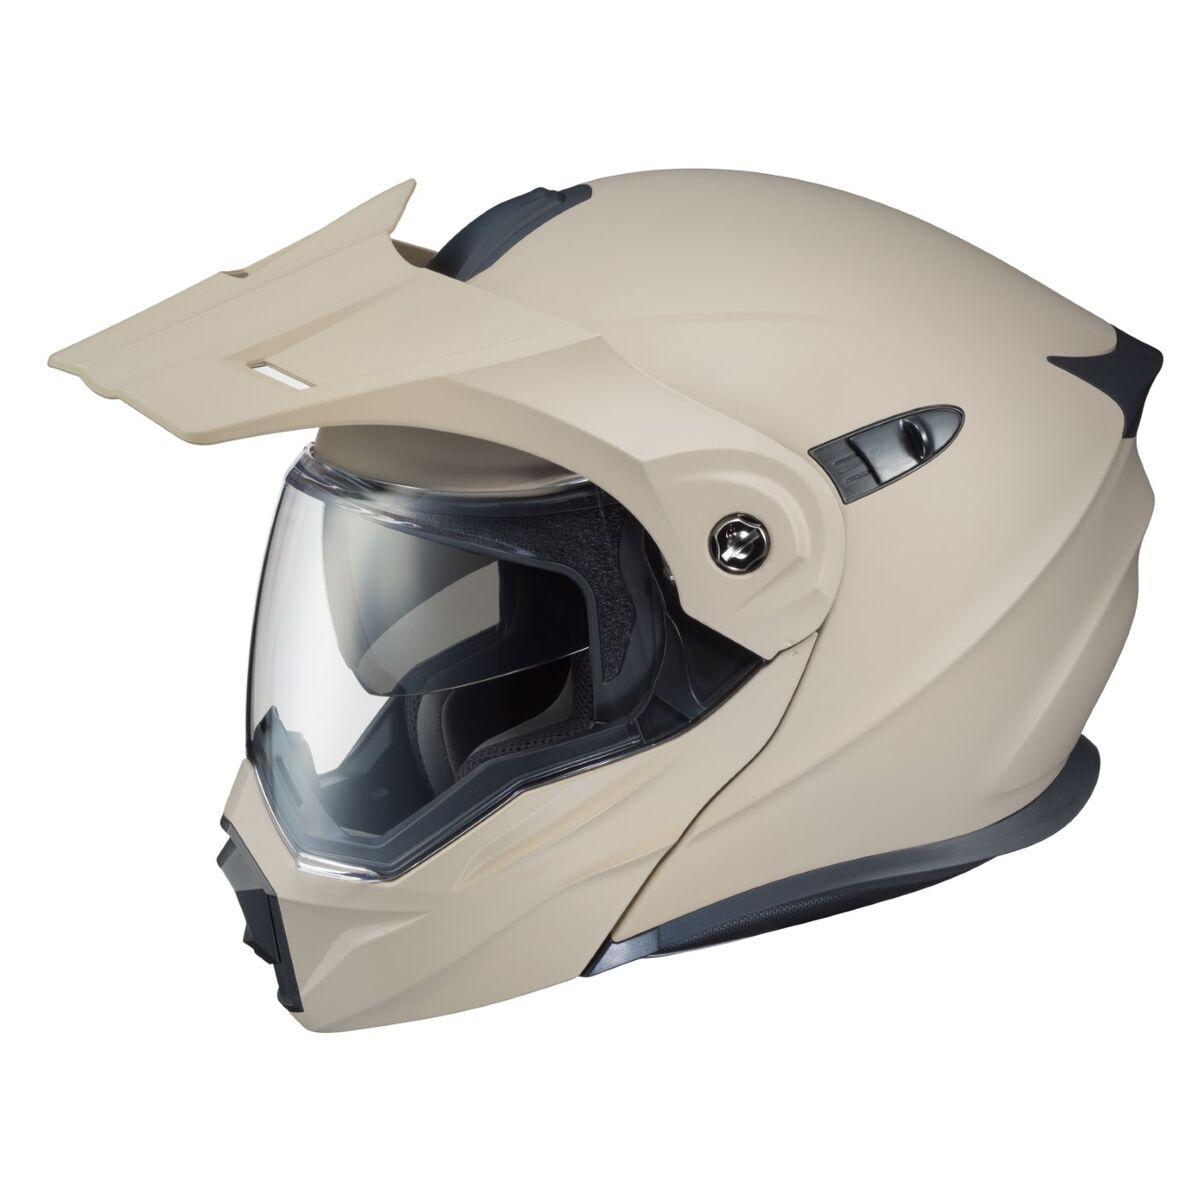 Scorpion EXO-AT950 adventure helmet